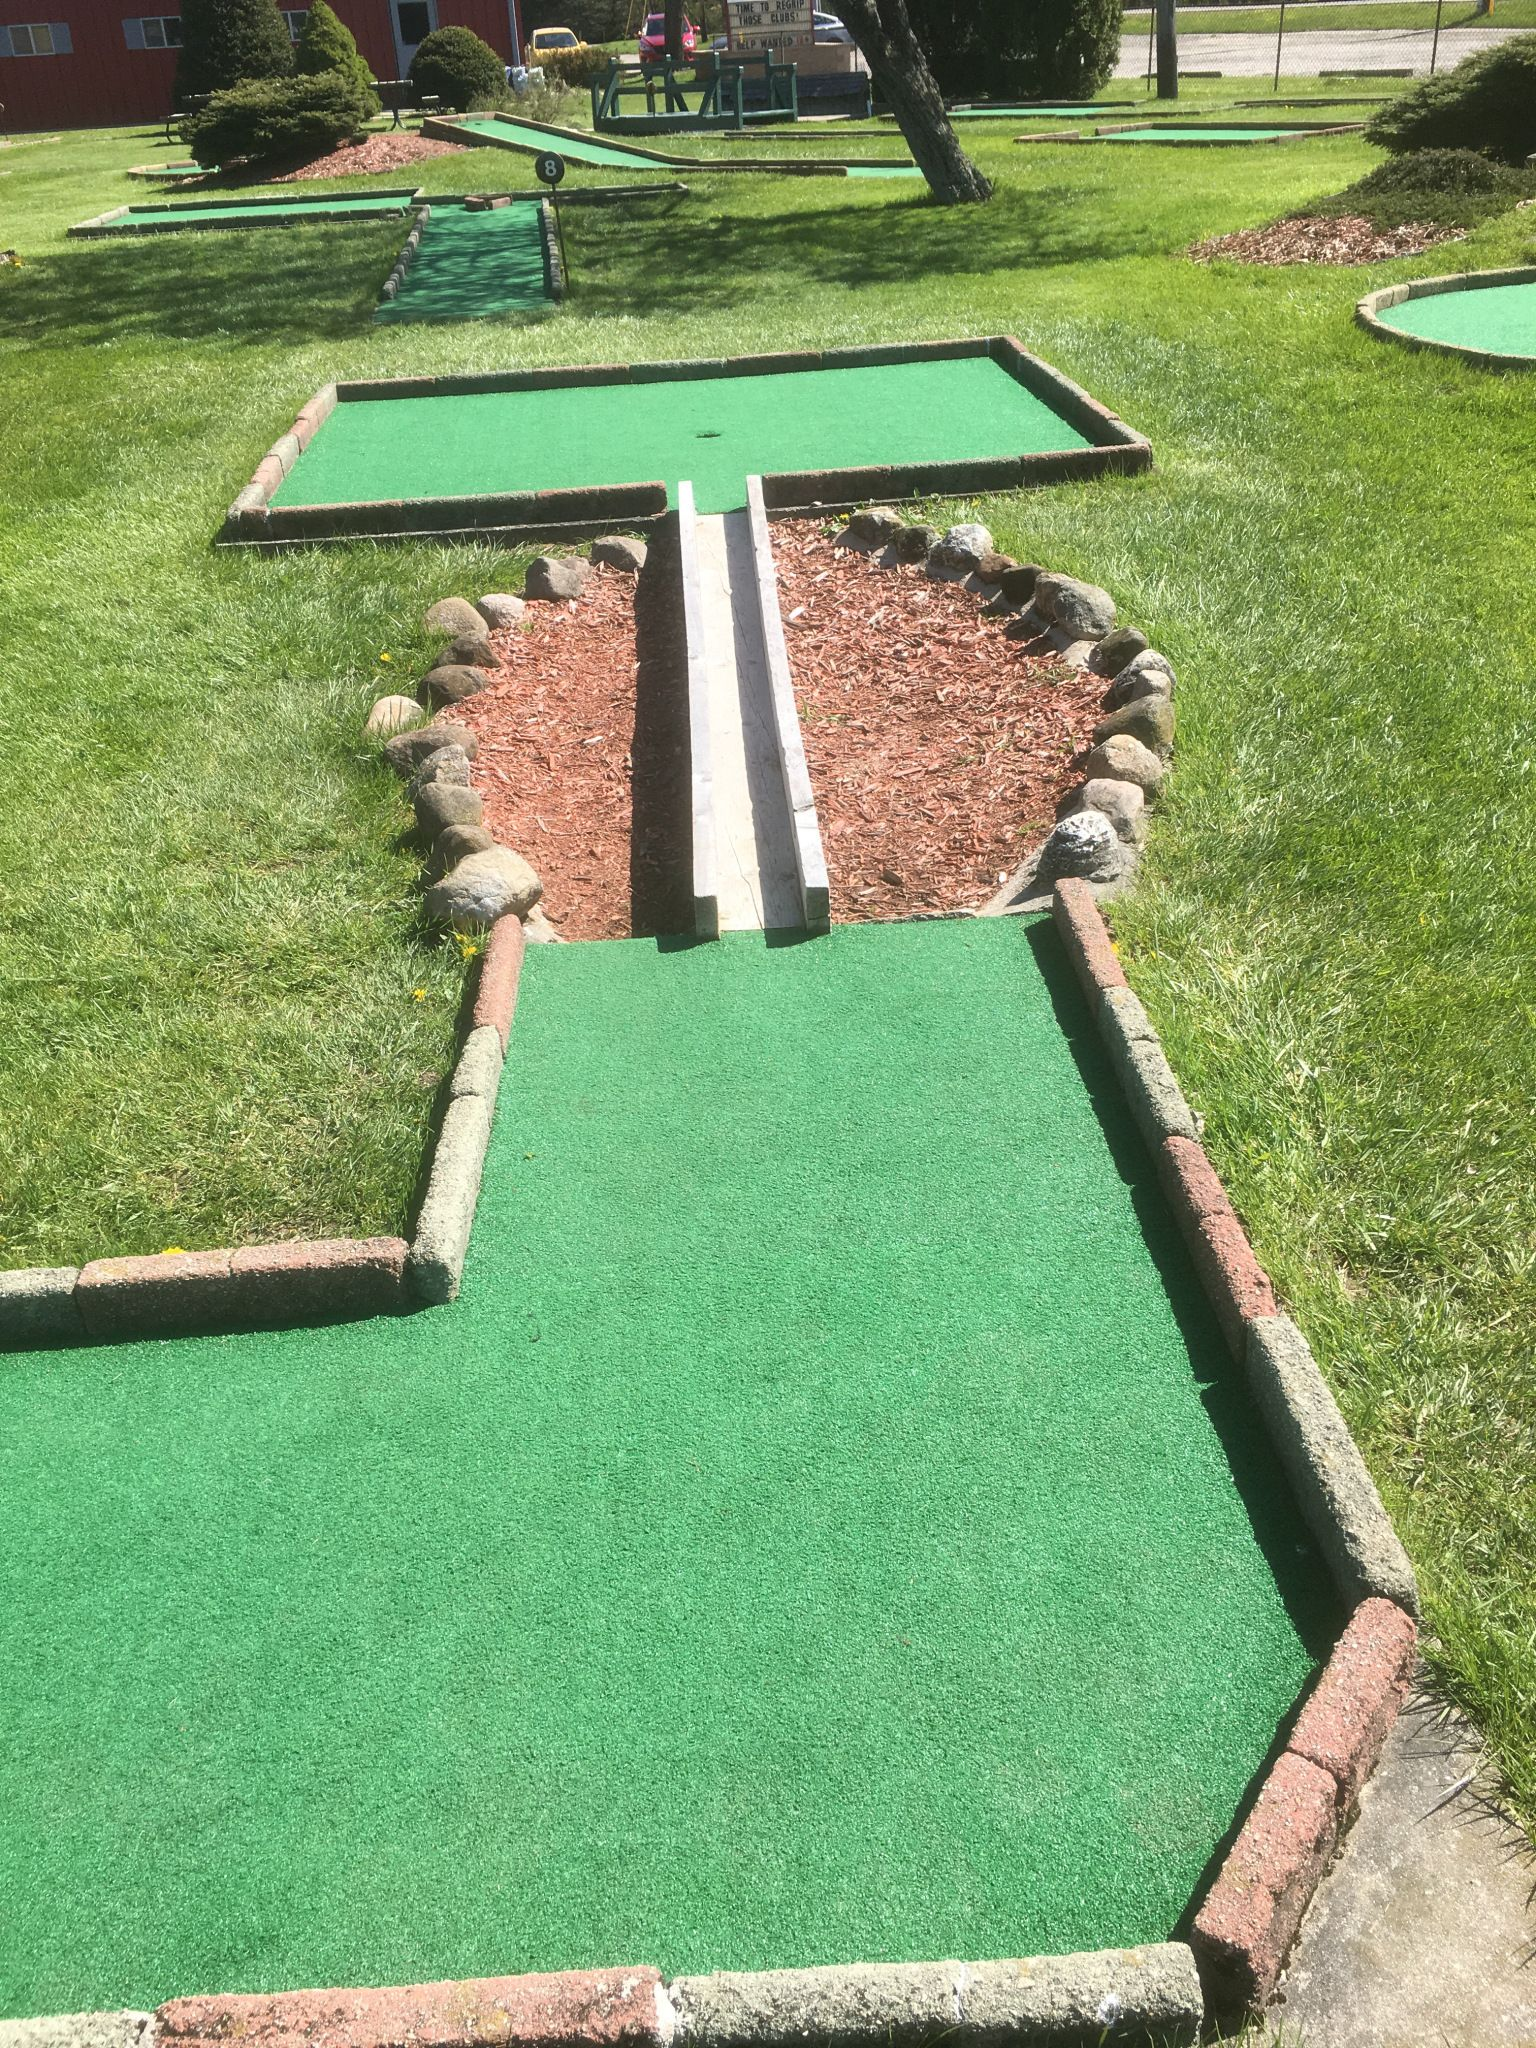 Baehmann's Golf Center | Mini golf, Miniature golf course ...